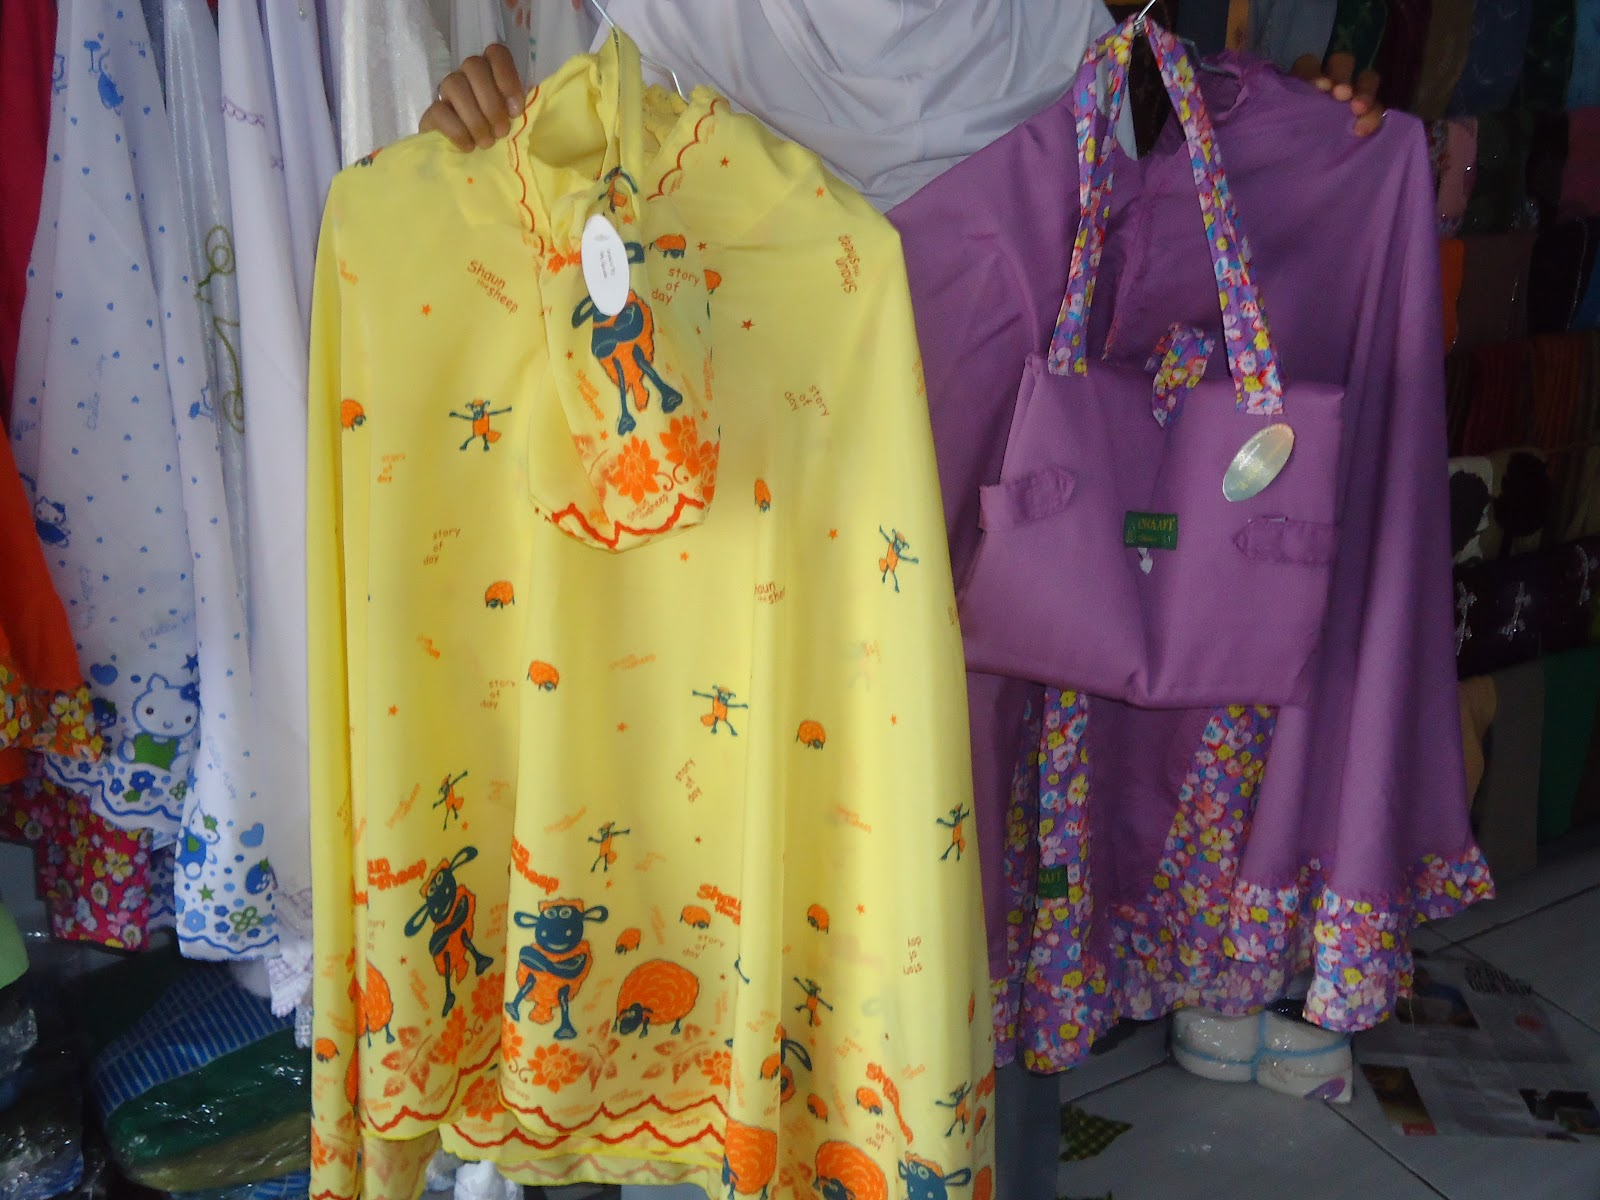 Jual Baju Anak Di Bandung Marketing And Dagang Mukena